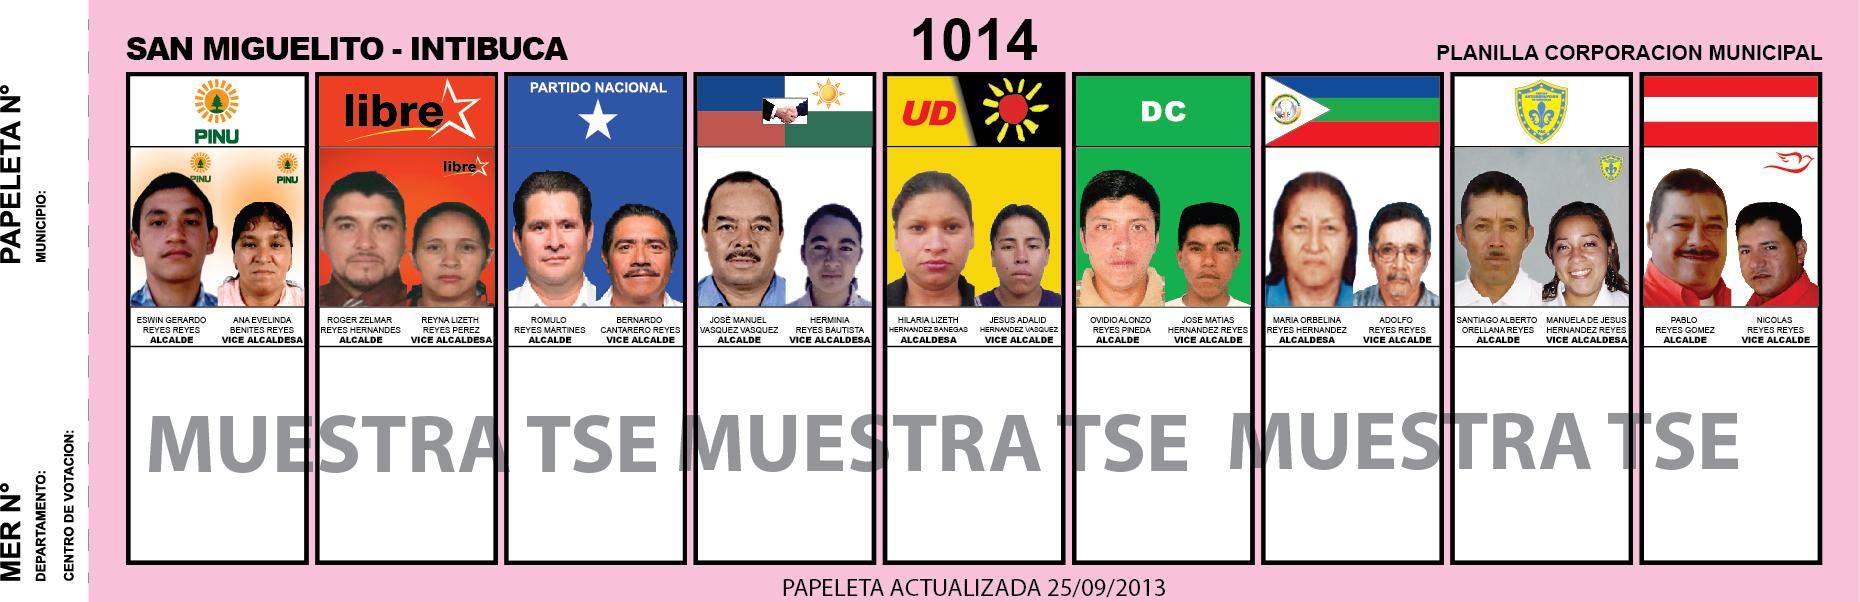 CANDIDATOS 2013 MUNICIPIO SAN MIGUELITO - INTIBUCA - HONDURAS